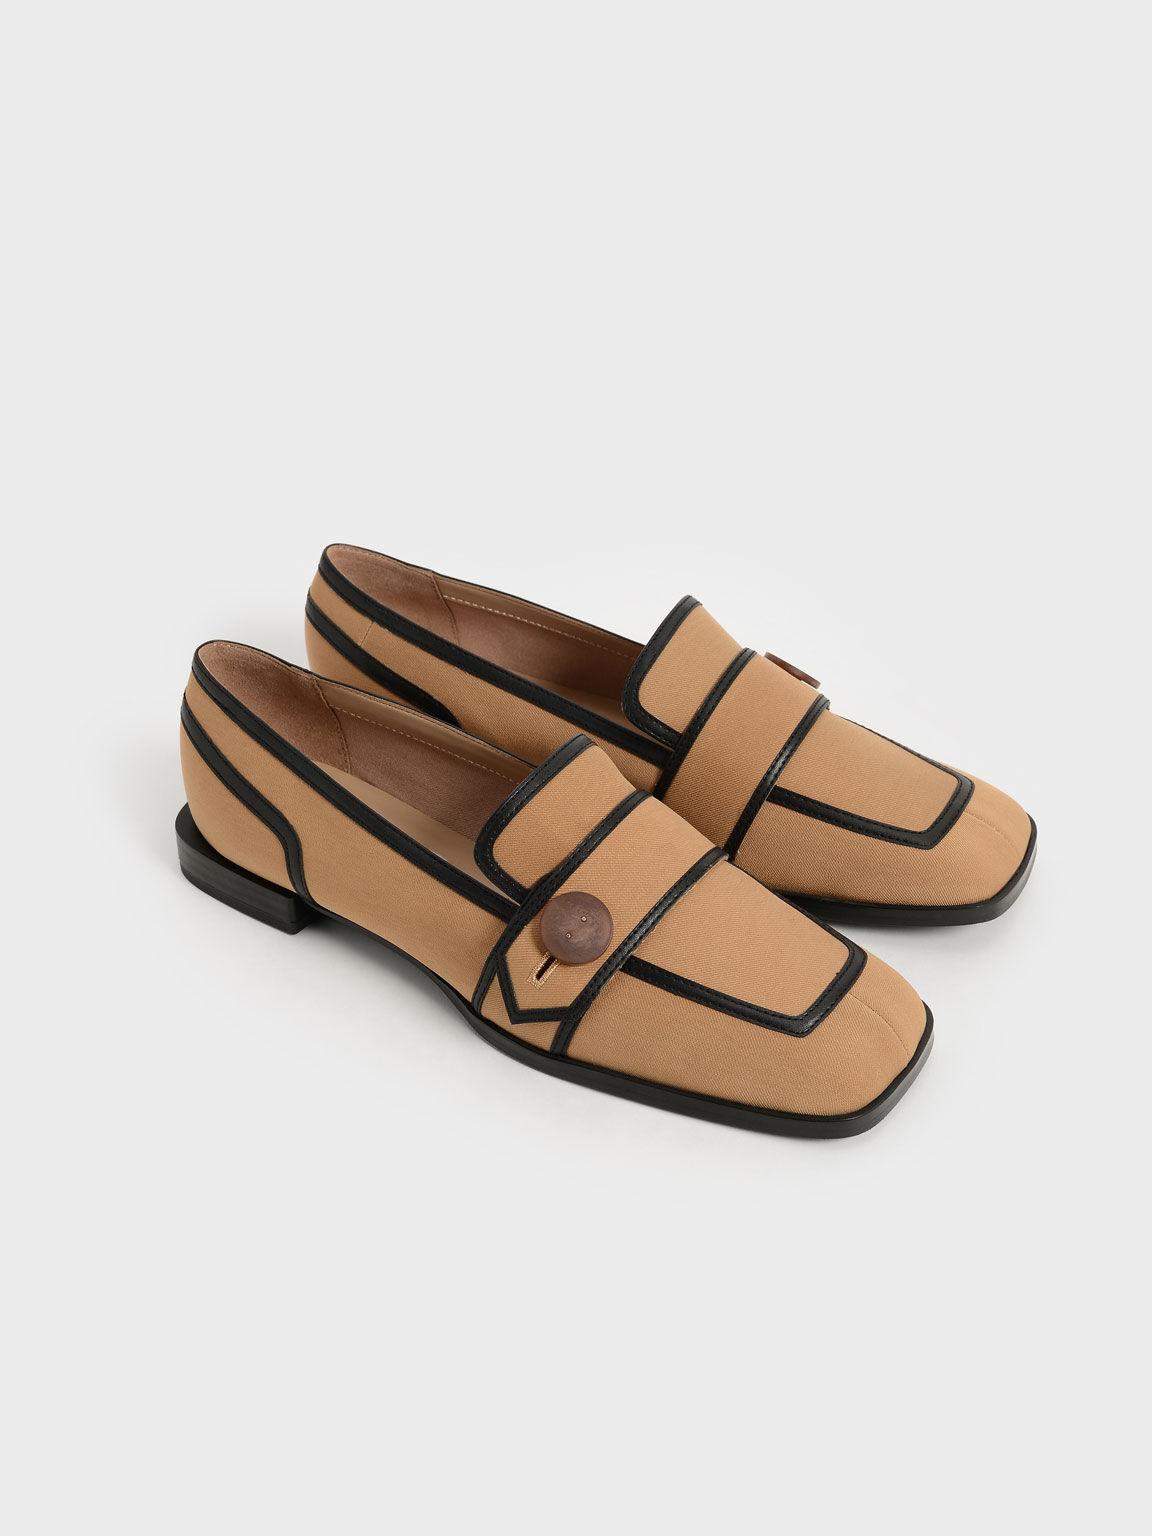 Button-Embellished Twill Loafers, Camel, hi-res